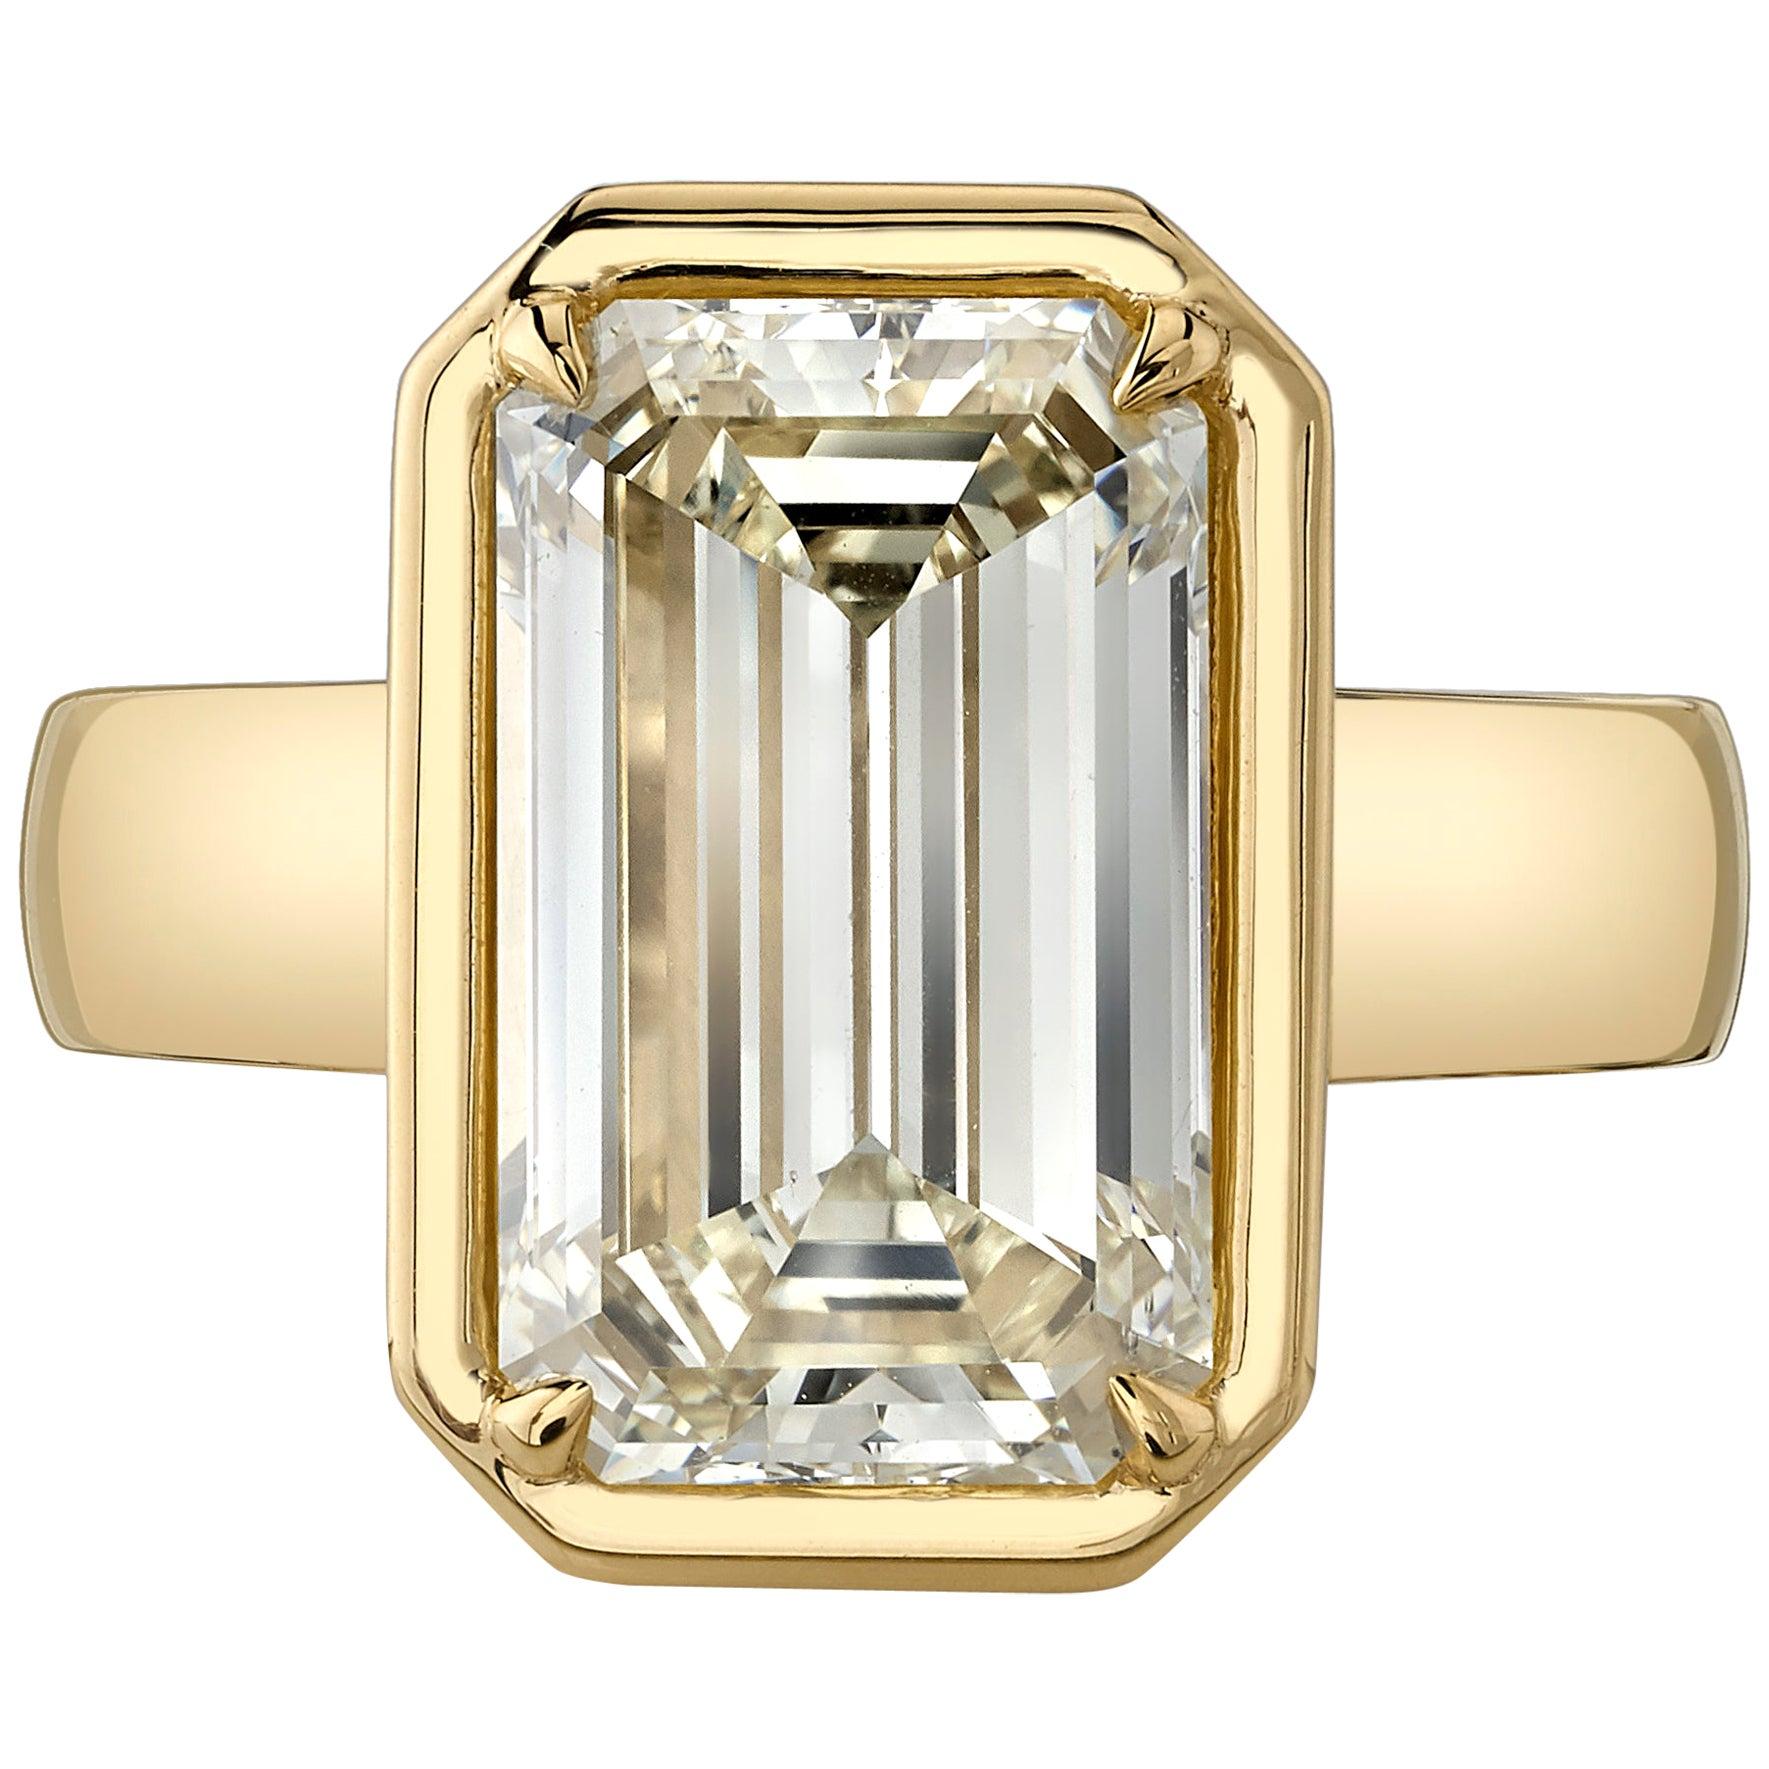 5.64 Carat Emerald Cut Diamond Set in a Handcrafted 18 Karat Yellow Gold Ring